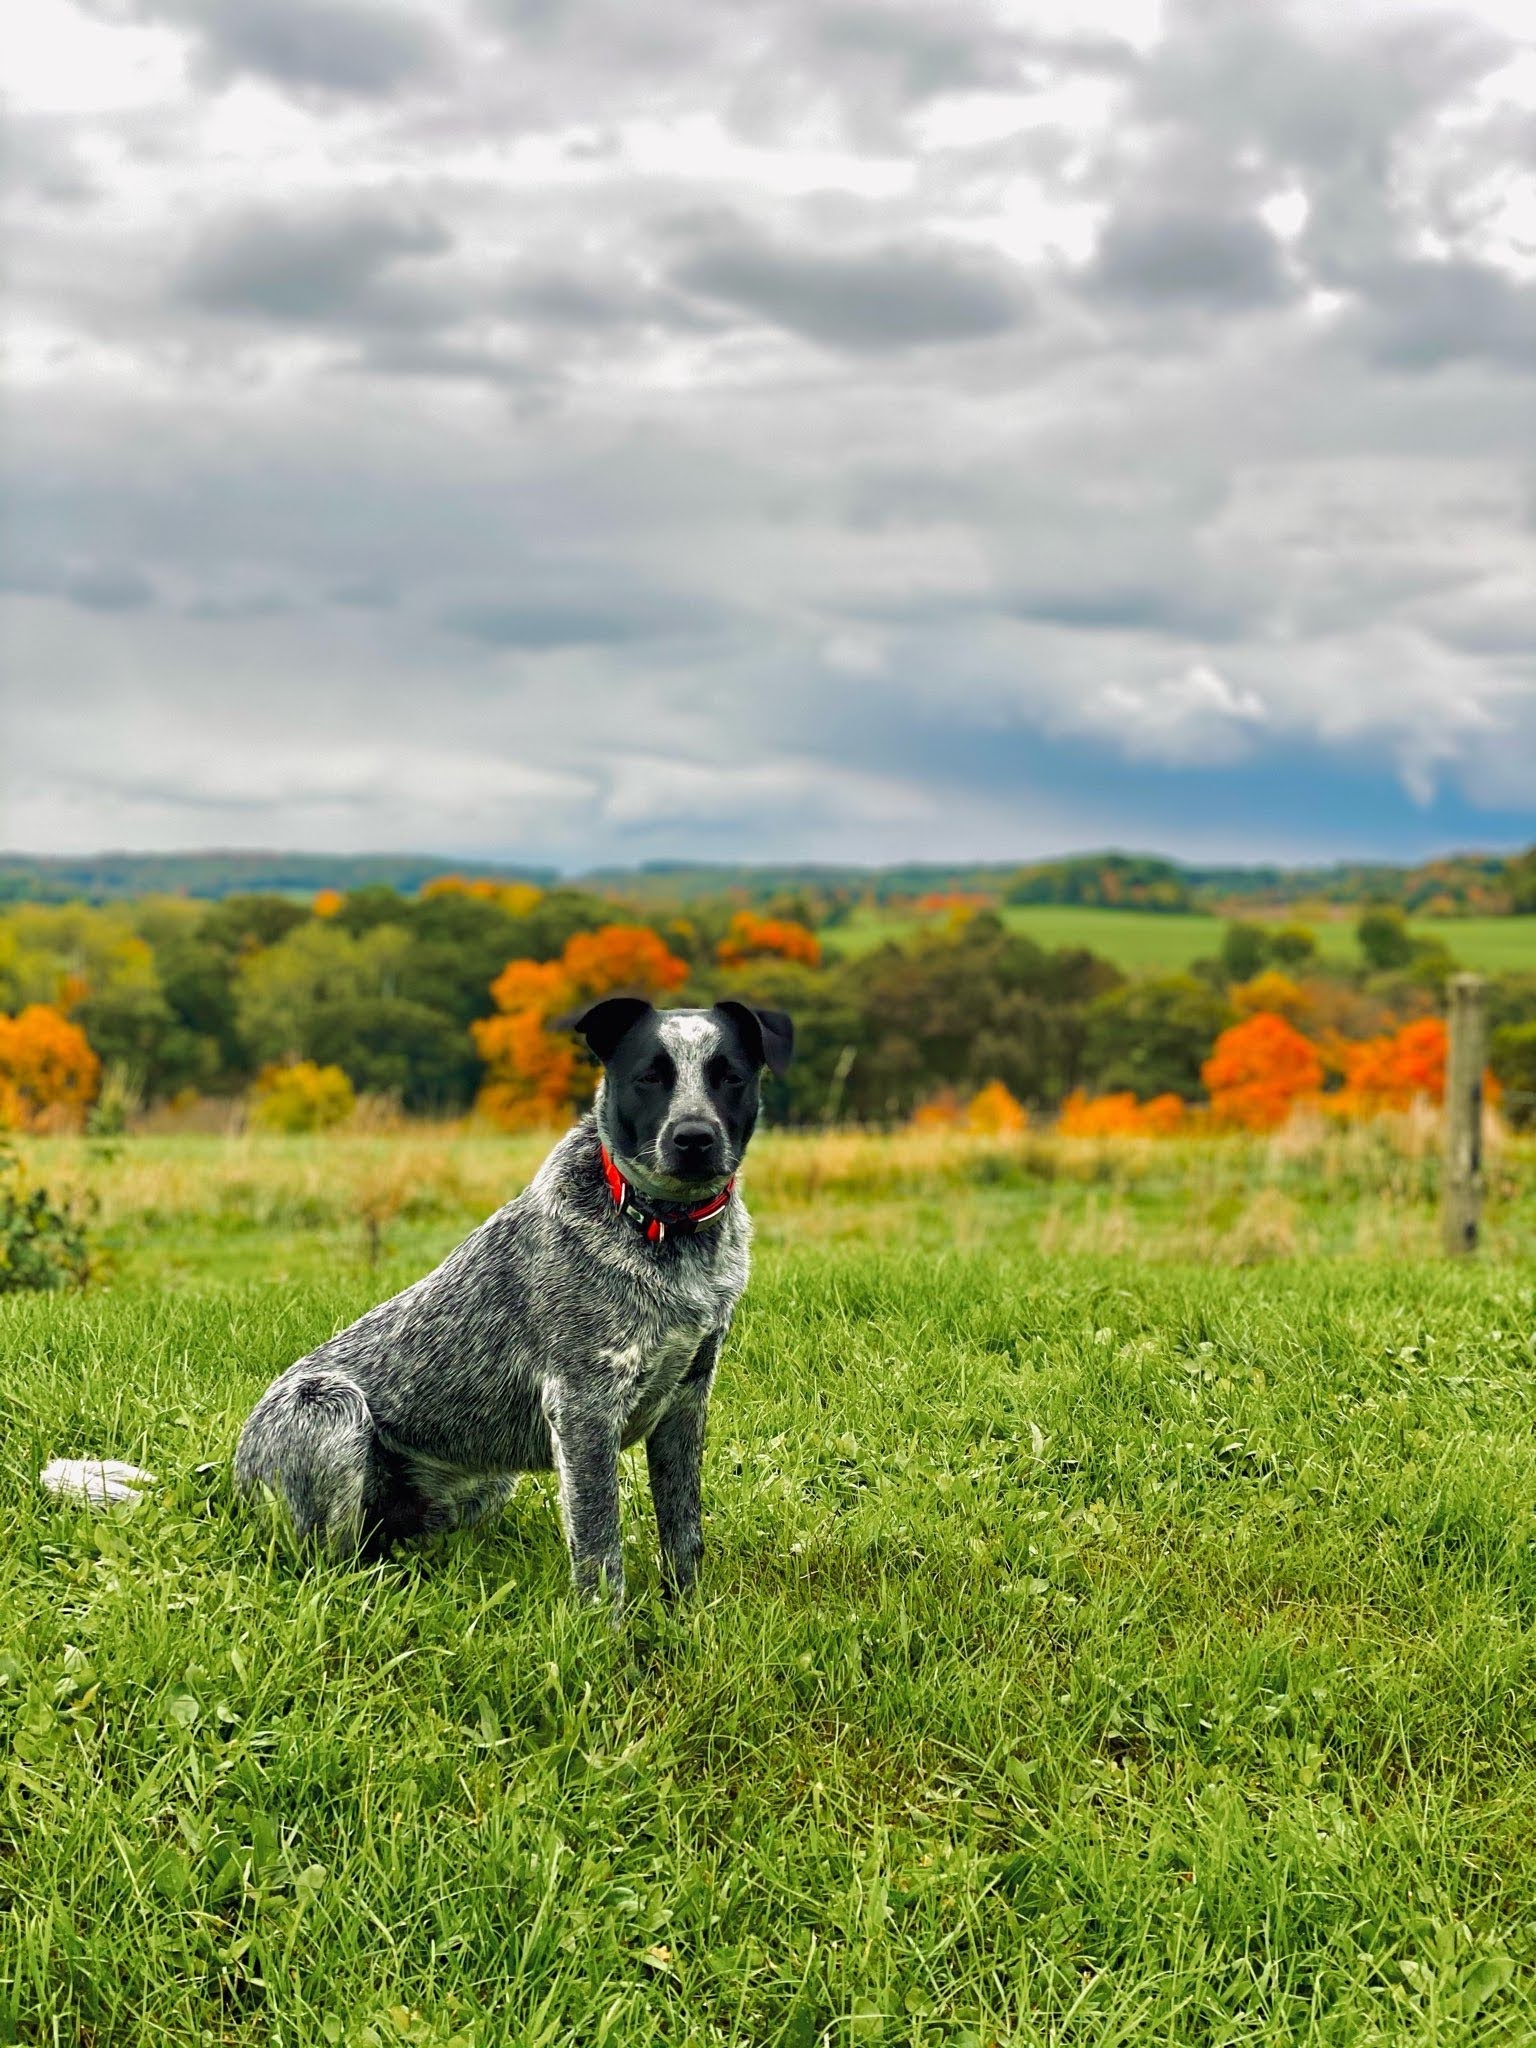 Sunrise Veterinary Services - Reedsburg, WI. | IMG 4181